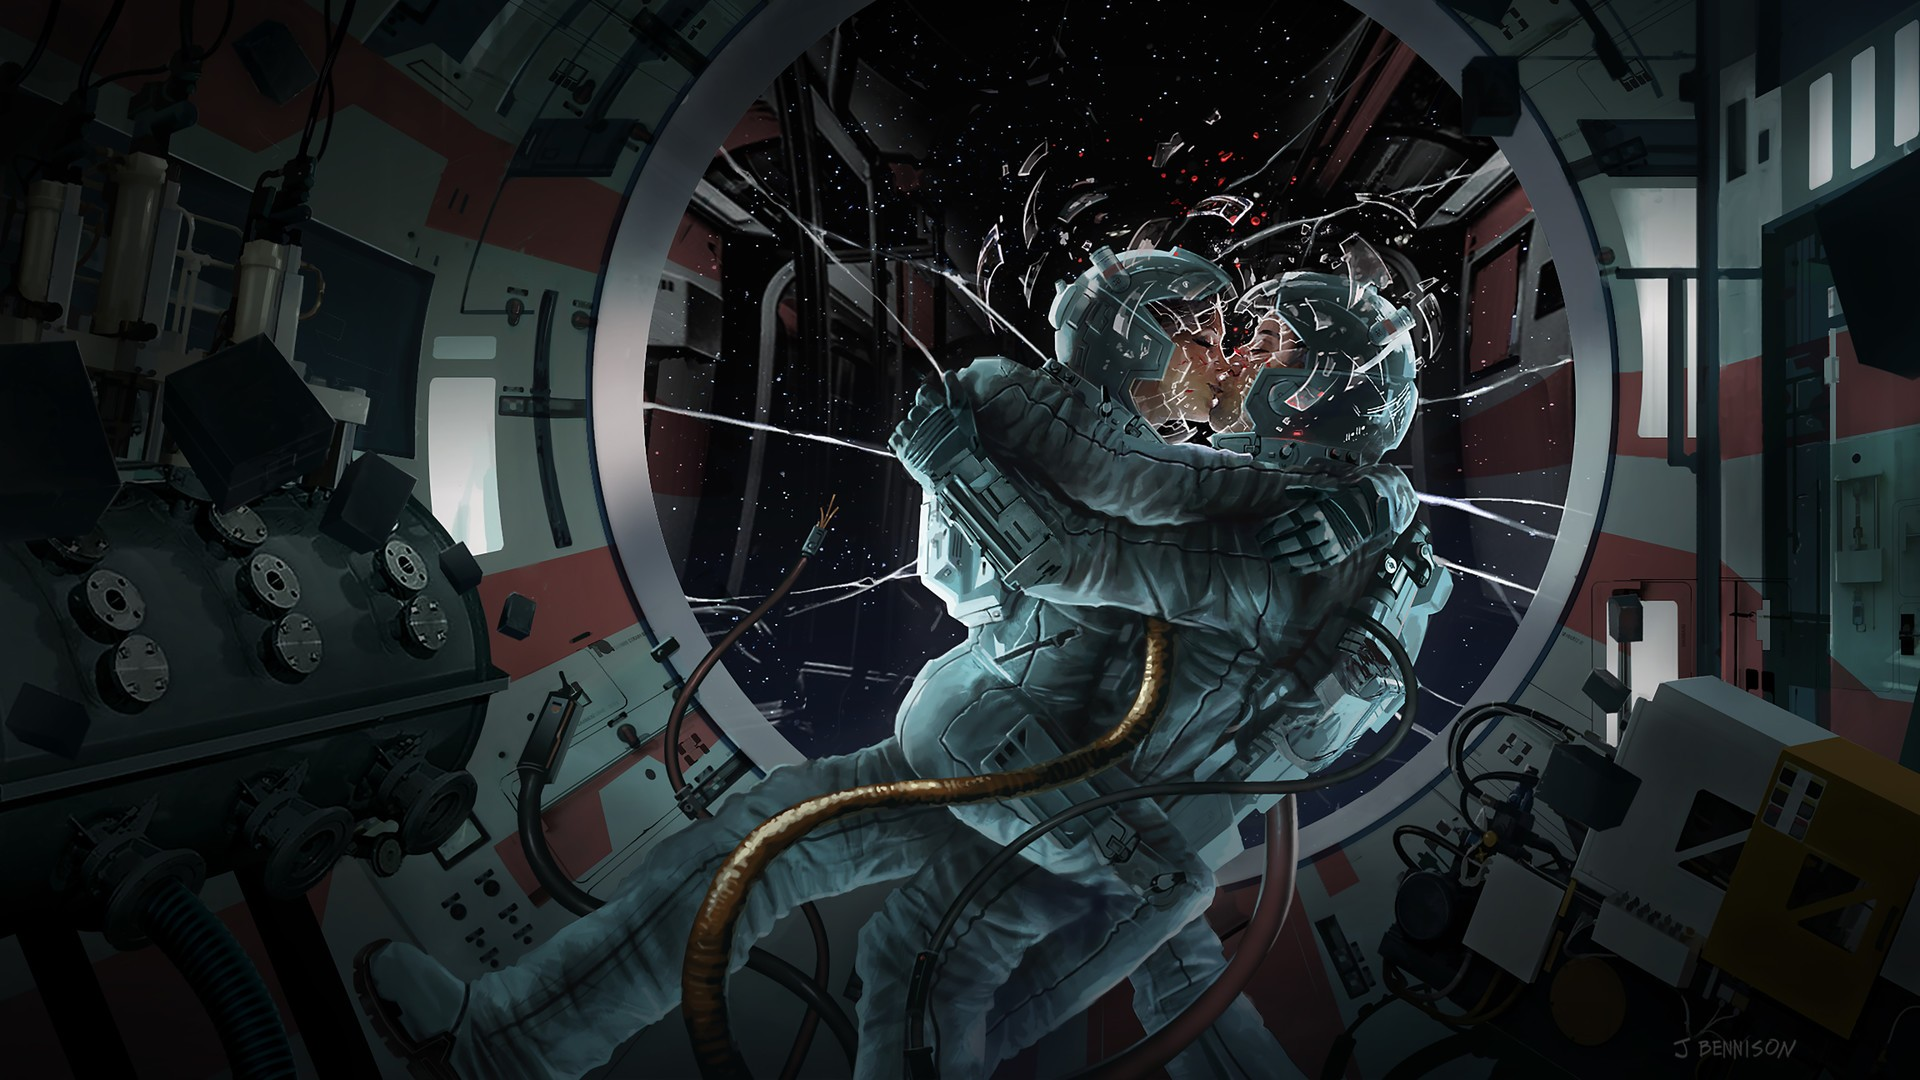 General 1920x1080 space window space suit stars artwork astronaut